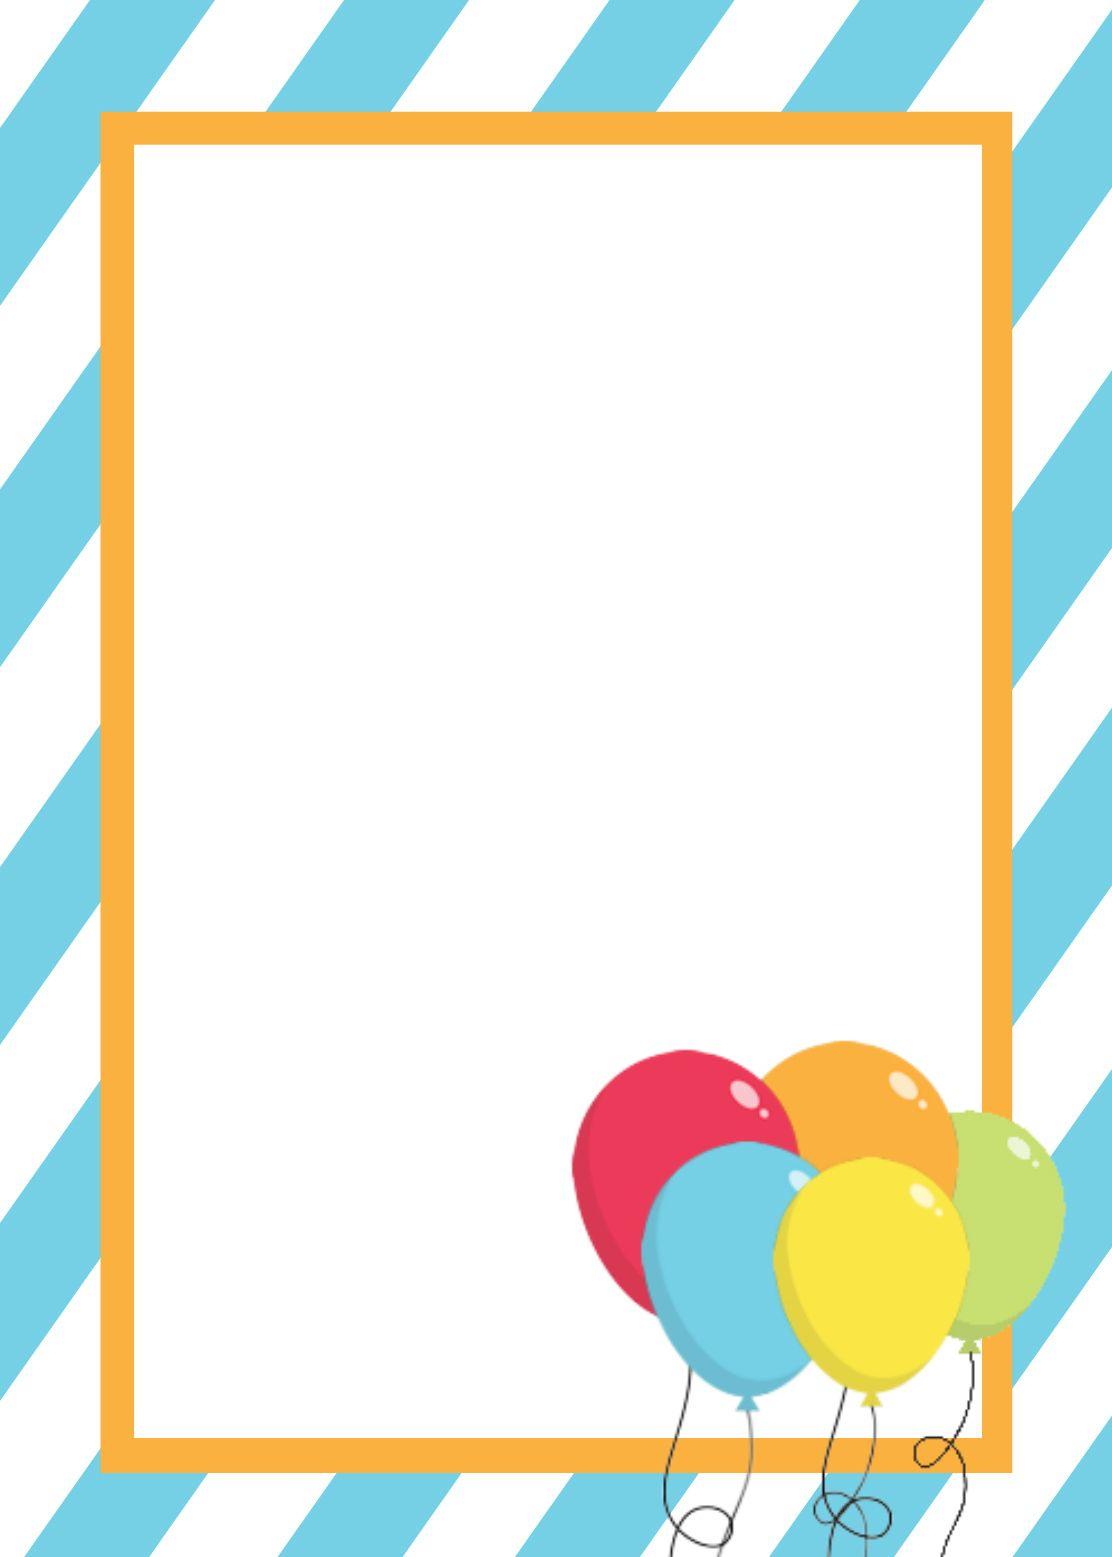 Free Printable Birthday Invitation Templates | Birthday Ideas And - Free Printable Birthday Scrolls